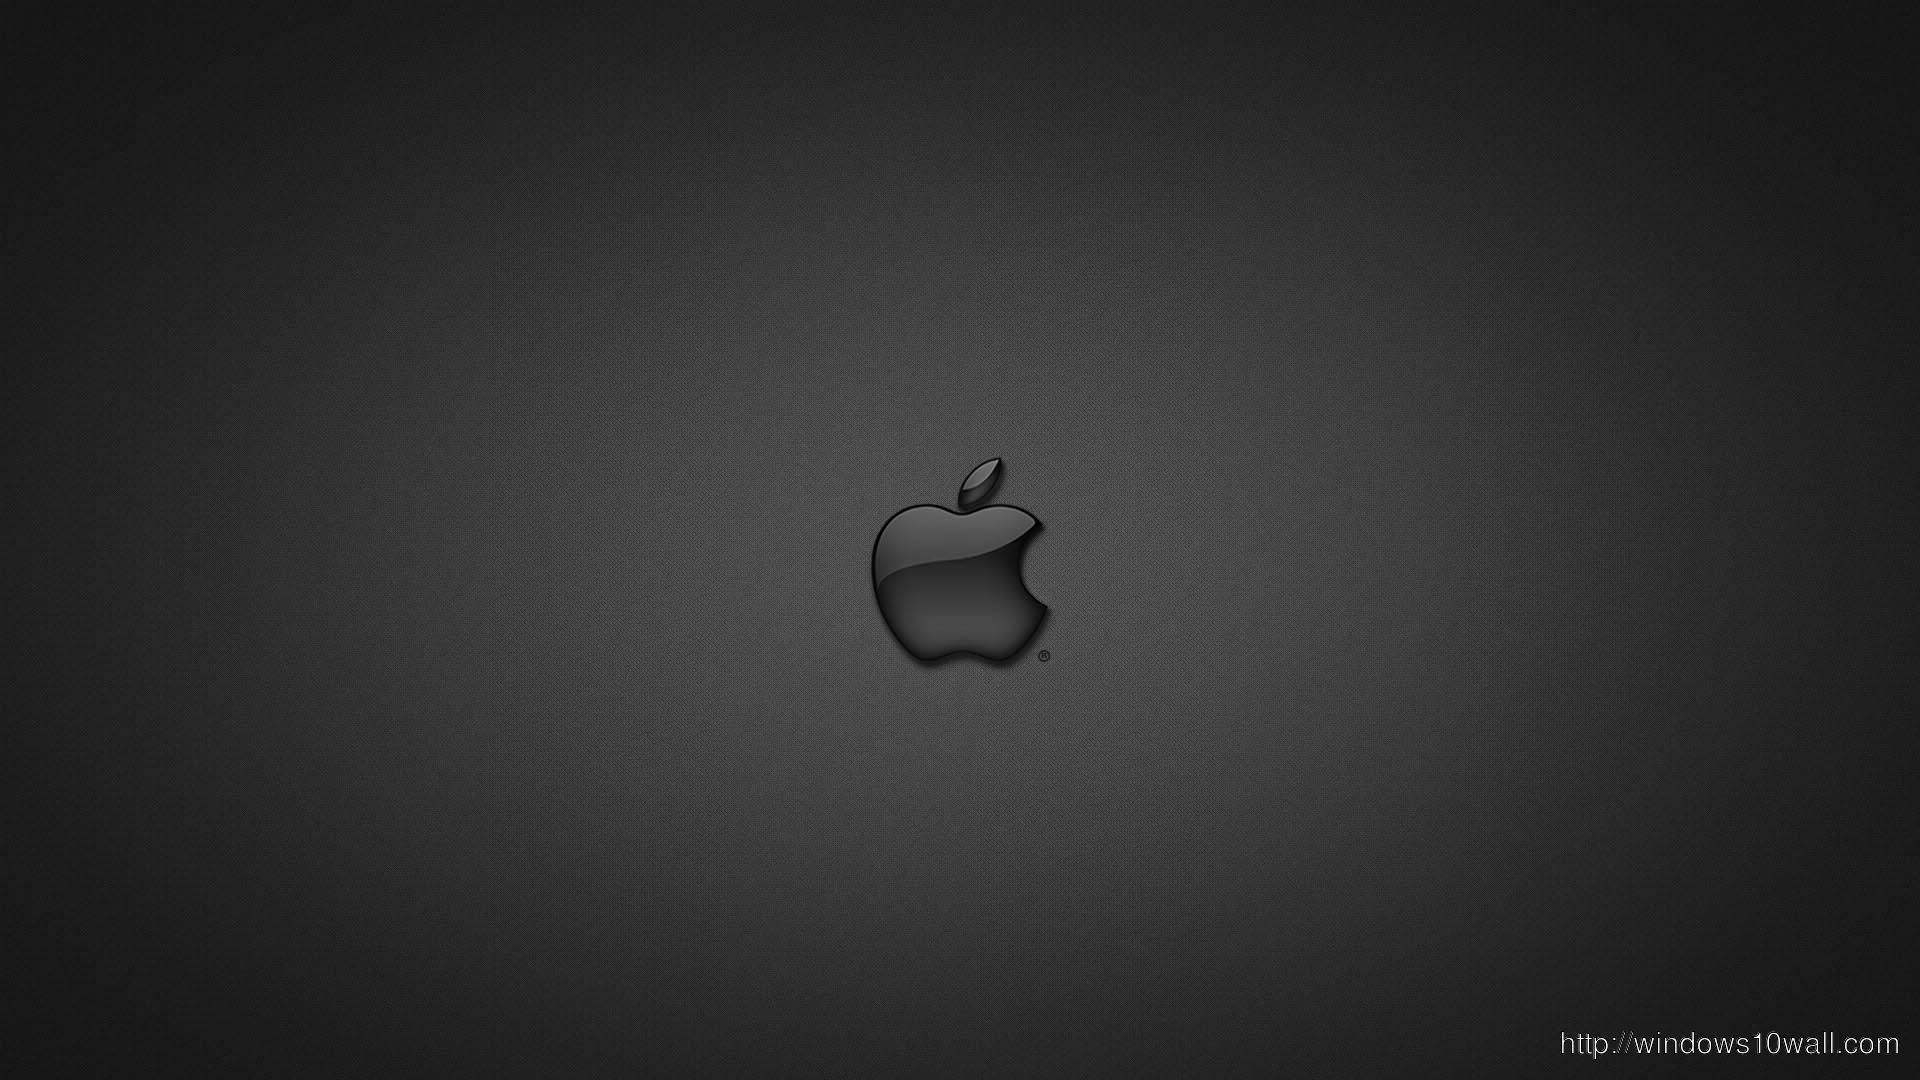 Apple Logo Background Hd